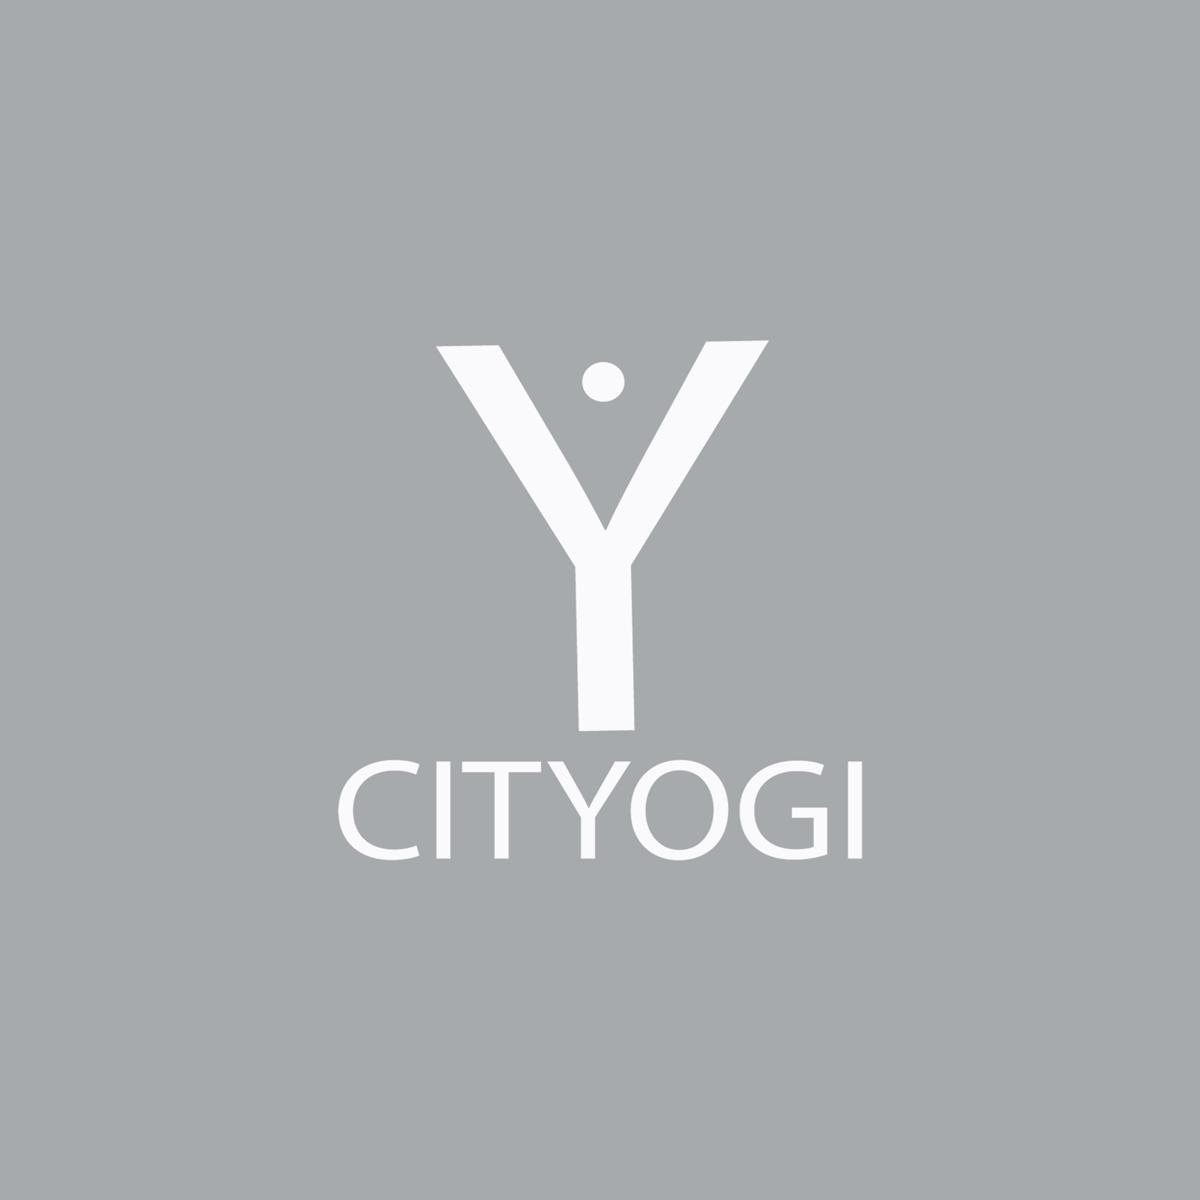 Cityogi_white_logo.png